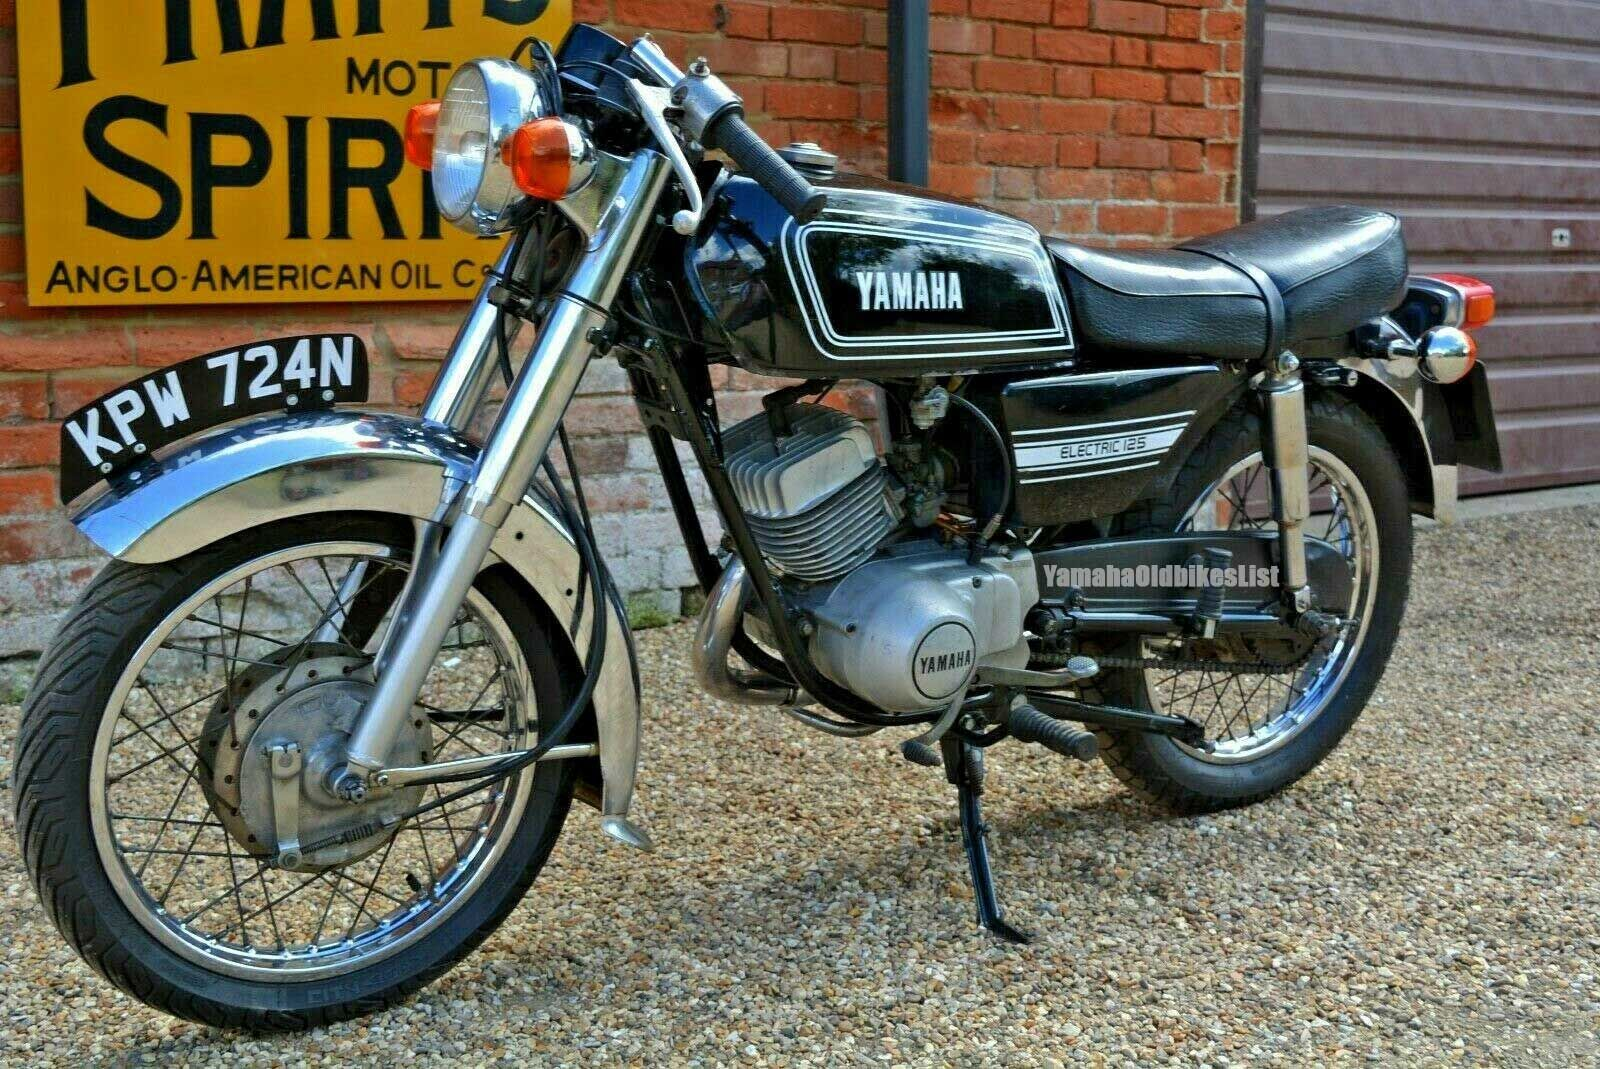 Classic 1974 Yamaha Rs 125 E Cafe Racer